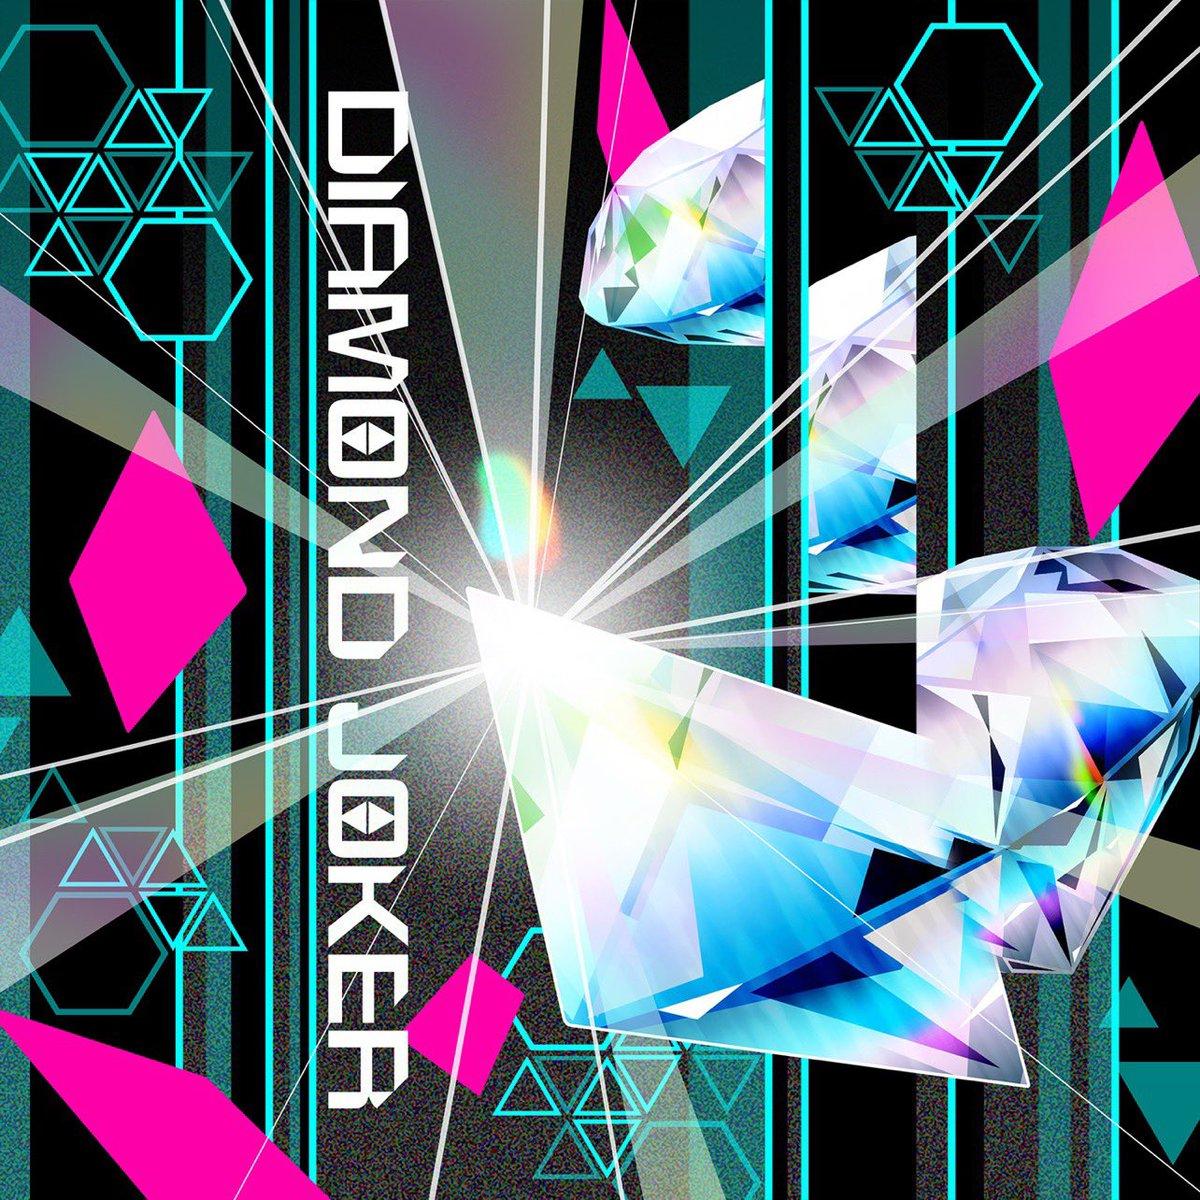 test ツイッターメディア - #Nowplaying DIAMOND JOKER - 伊吹 翼 (CV.Machico)、徳川まつり (CV.諏訪彩花)、四条貴音 (CV.原 由実)、所 恵美 (CV.藤井ゆきよ) (DIAMOND JOKER - Single) https://t.co/PCAsVyrB74